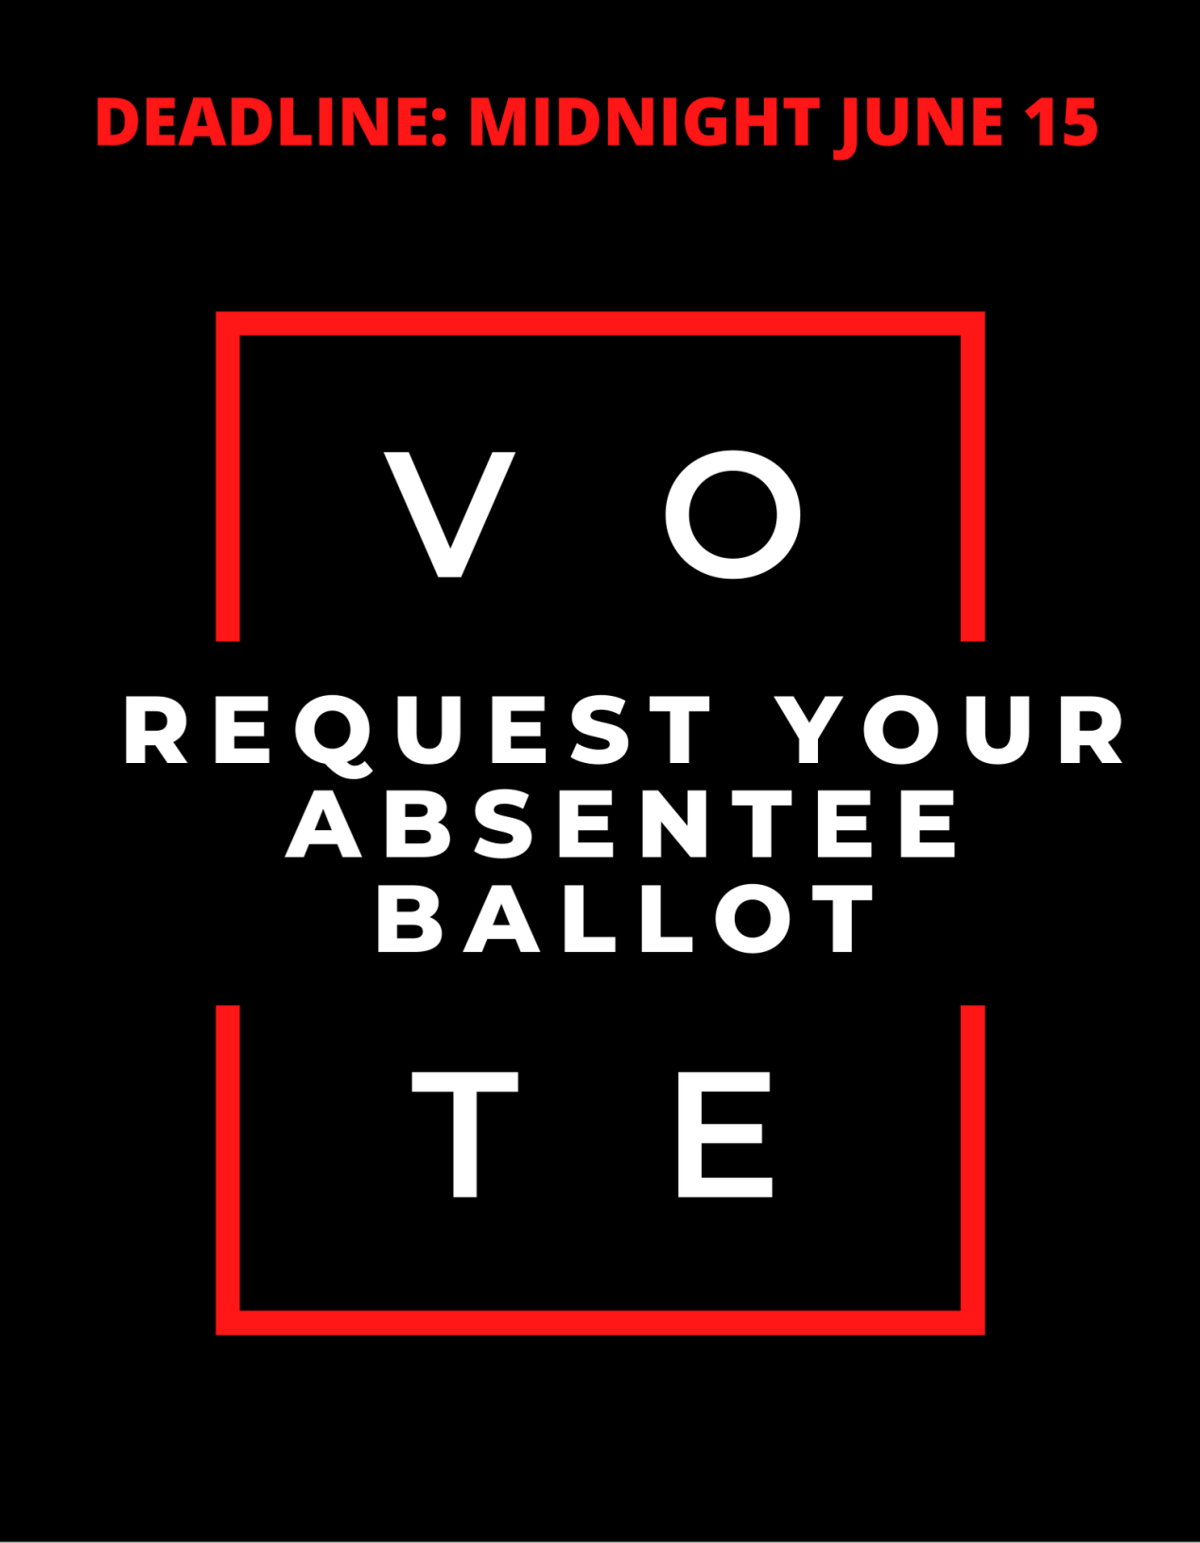 Request your ballot deadline